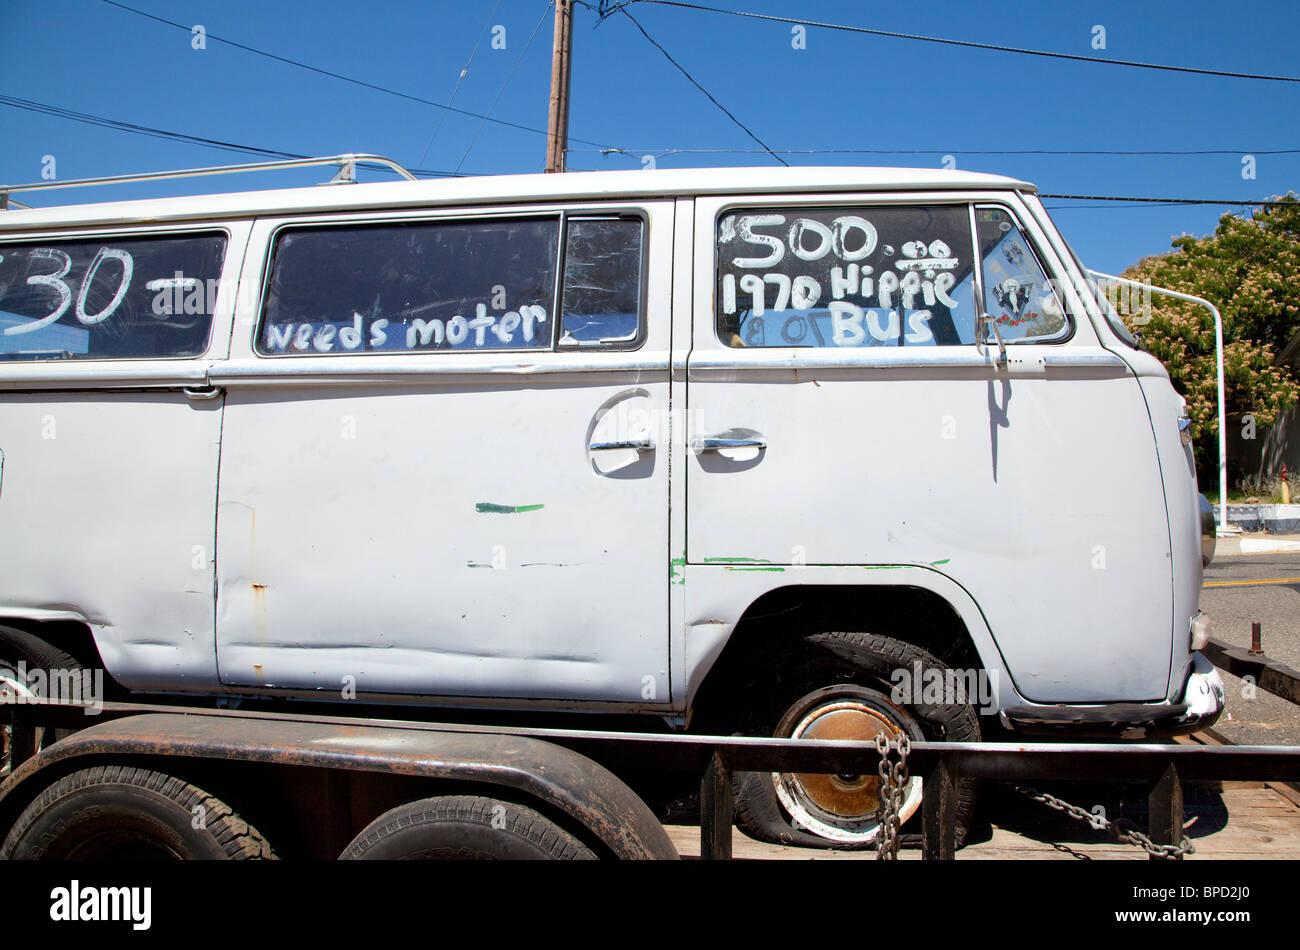 Old Hippie VW van for sale Stock Photo: 31020248 - Alamy